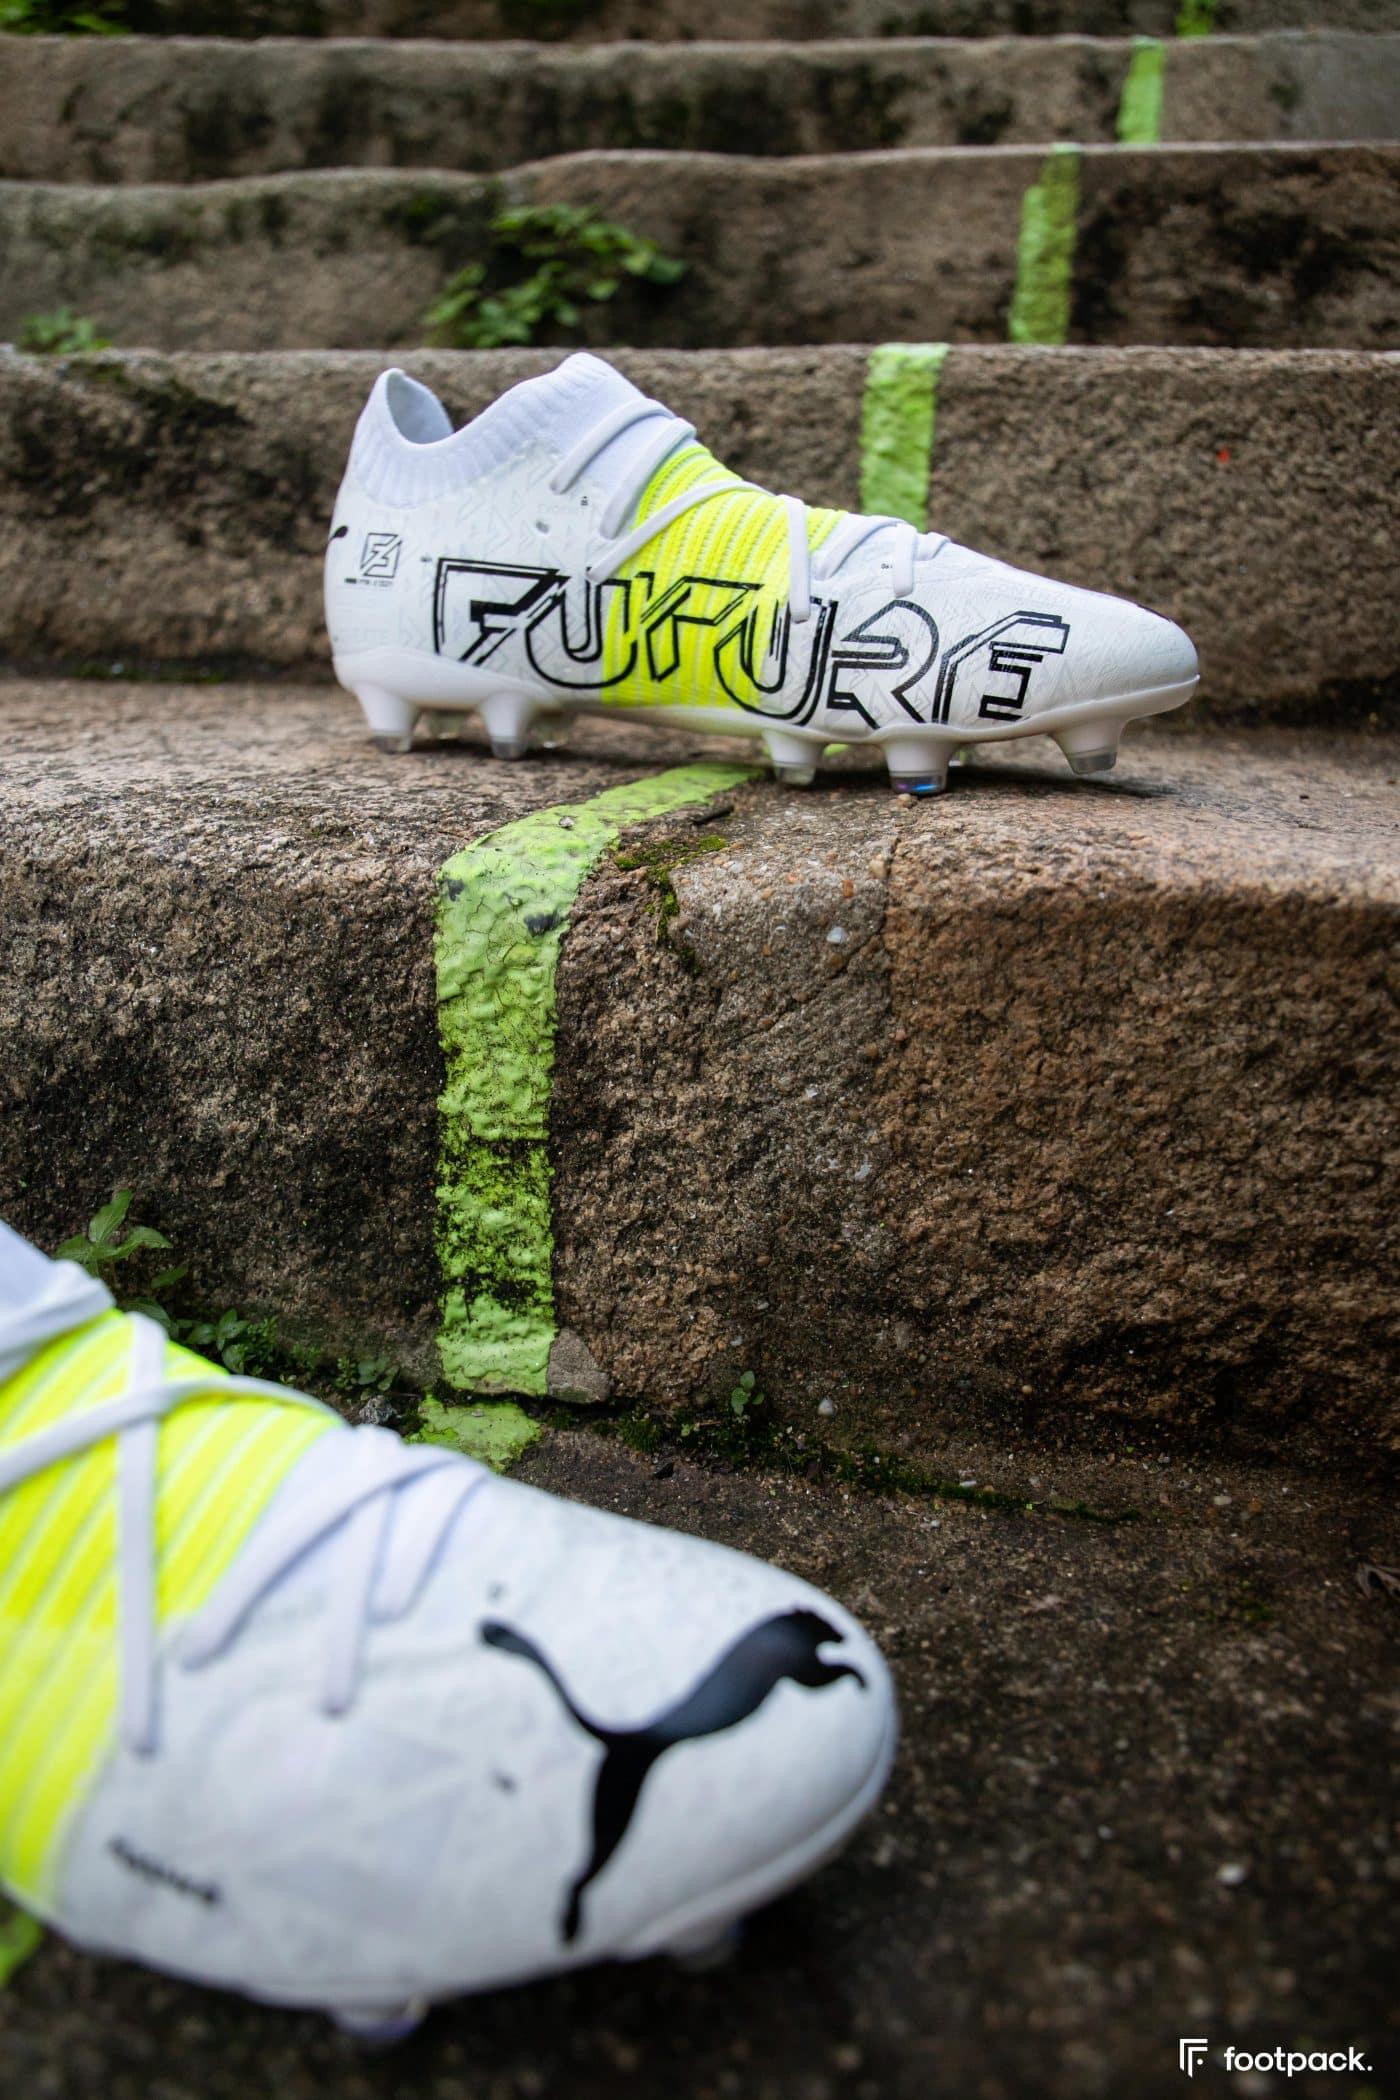 puma-future-z-teaser-edition-shooting-footpack-39